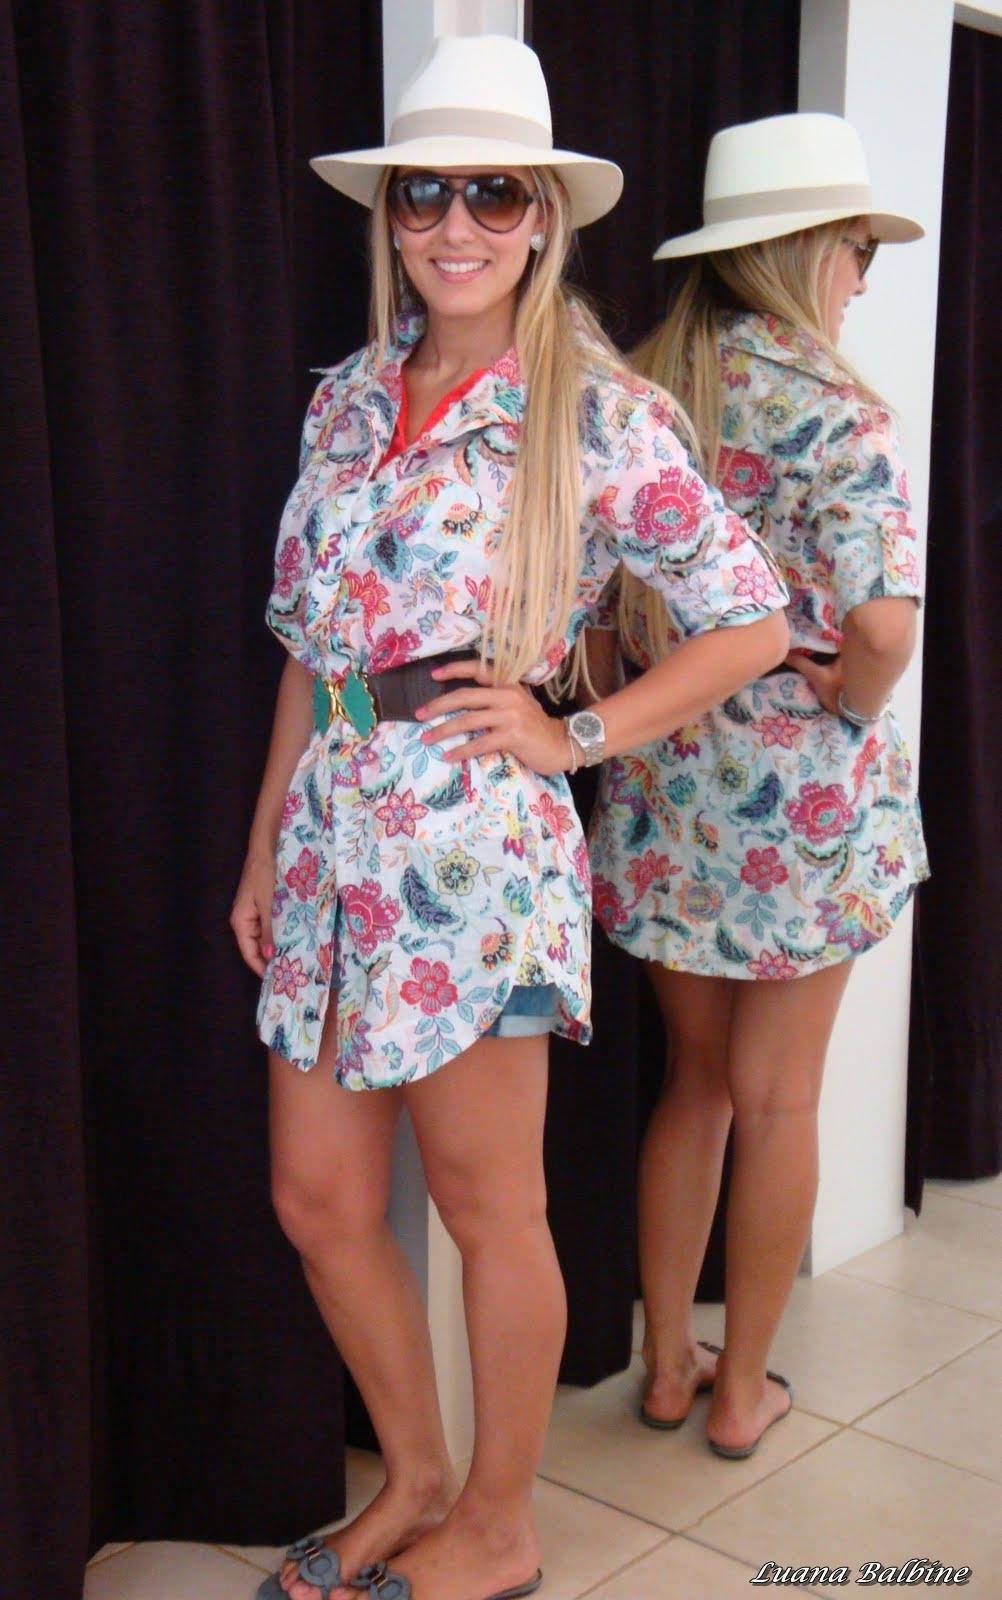 Alerta Fashion ♥ – Página  9 – Luana Balbine 5b80e14b72e